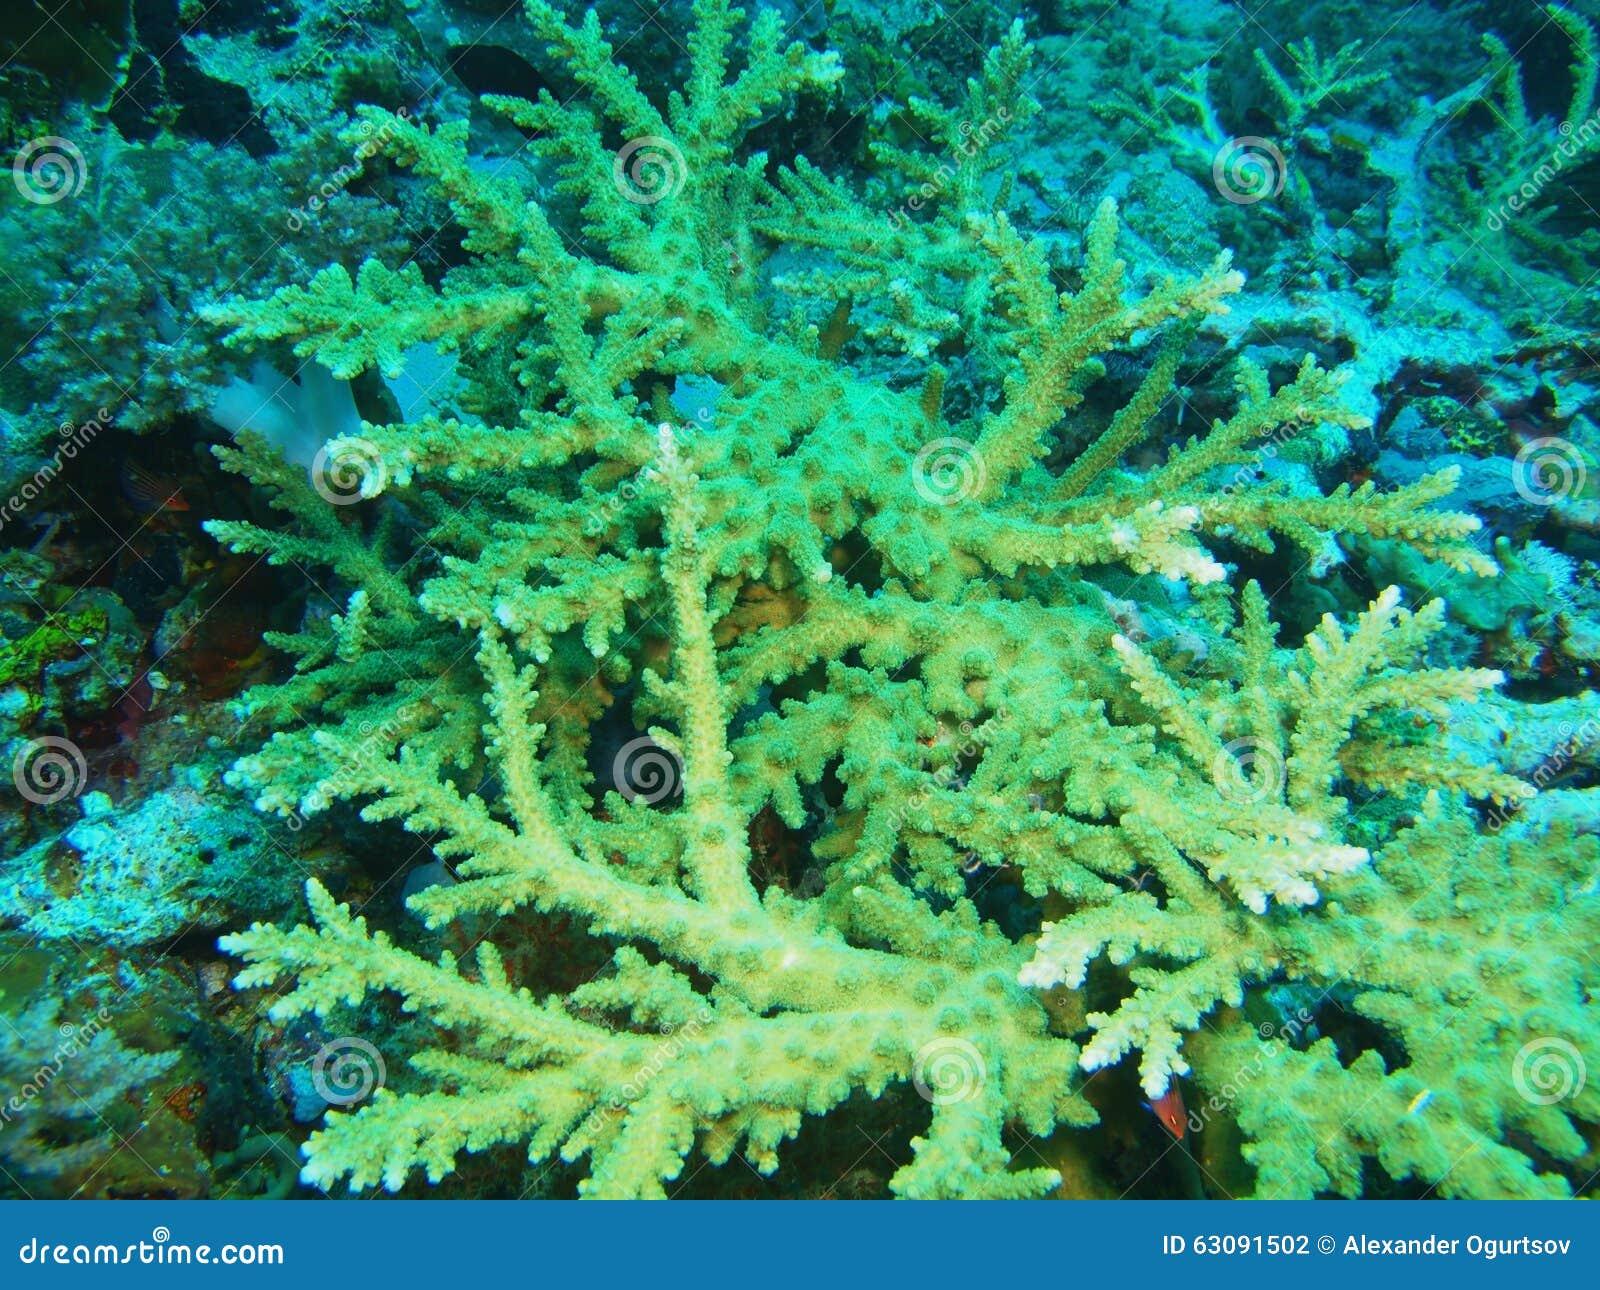 Download Corail en pierre photo stock. Image du animal, marin - 63091502